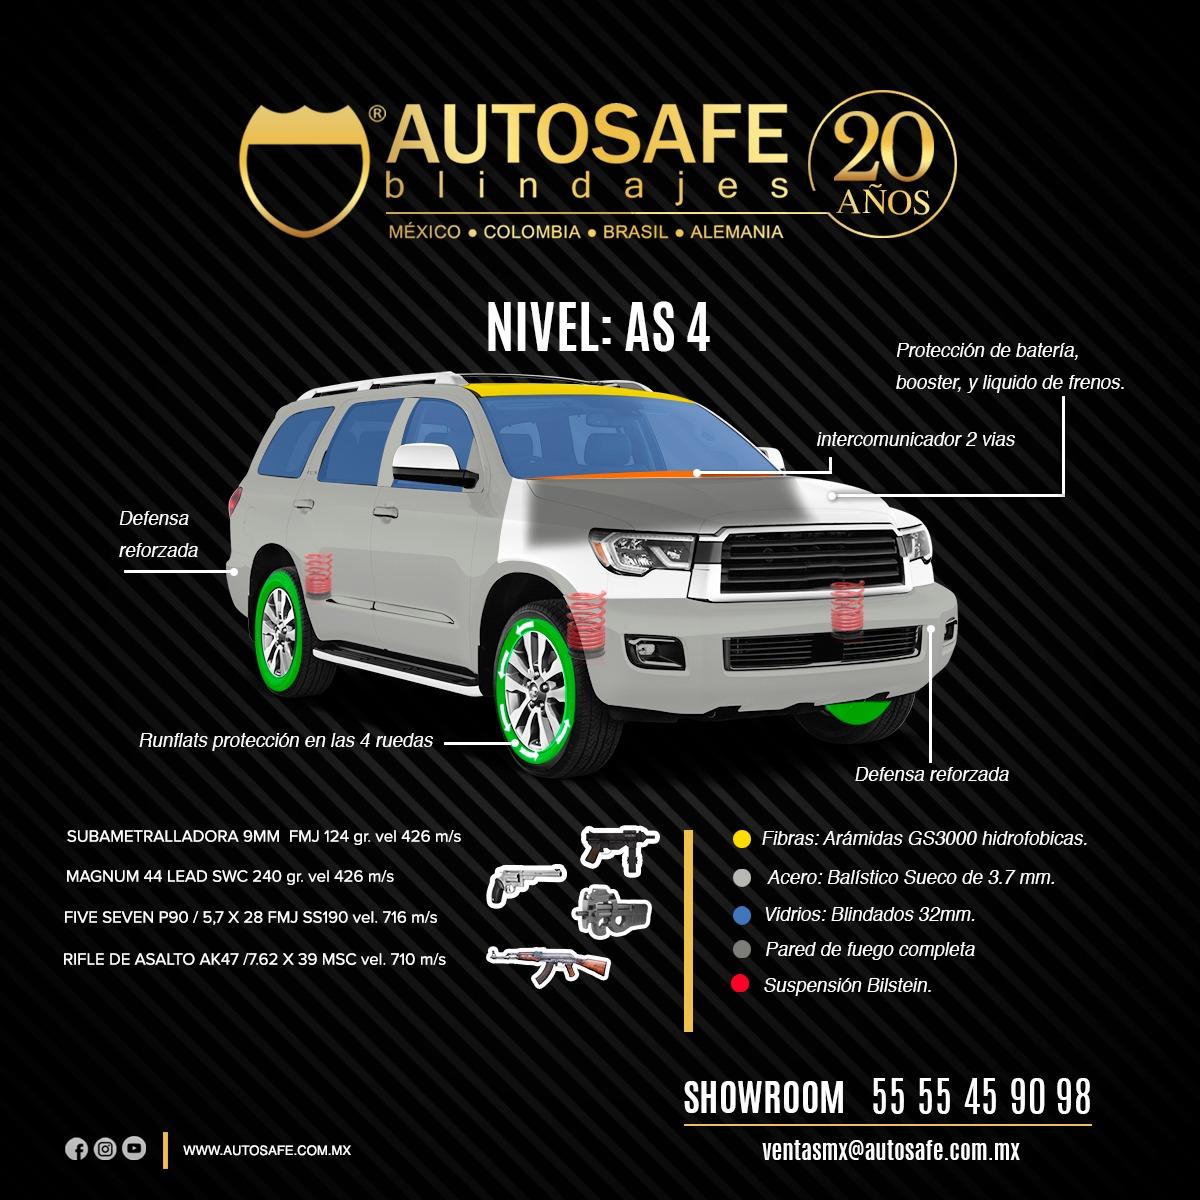 Auto Safe Blindaje - Nivel AS 4